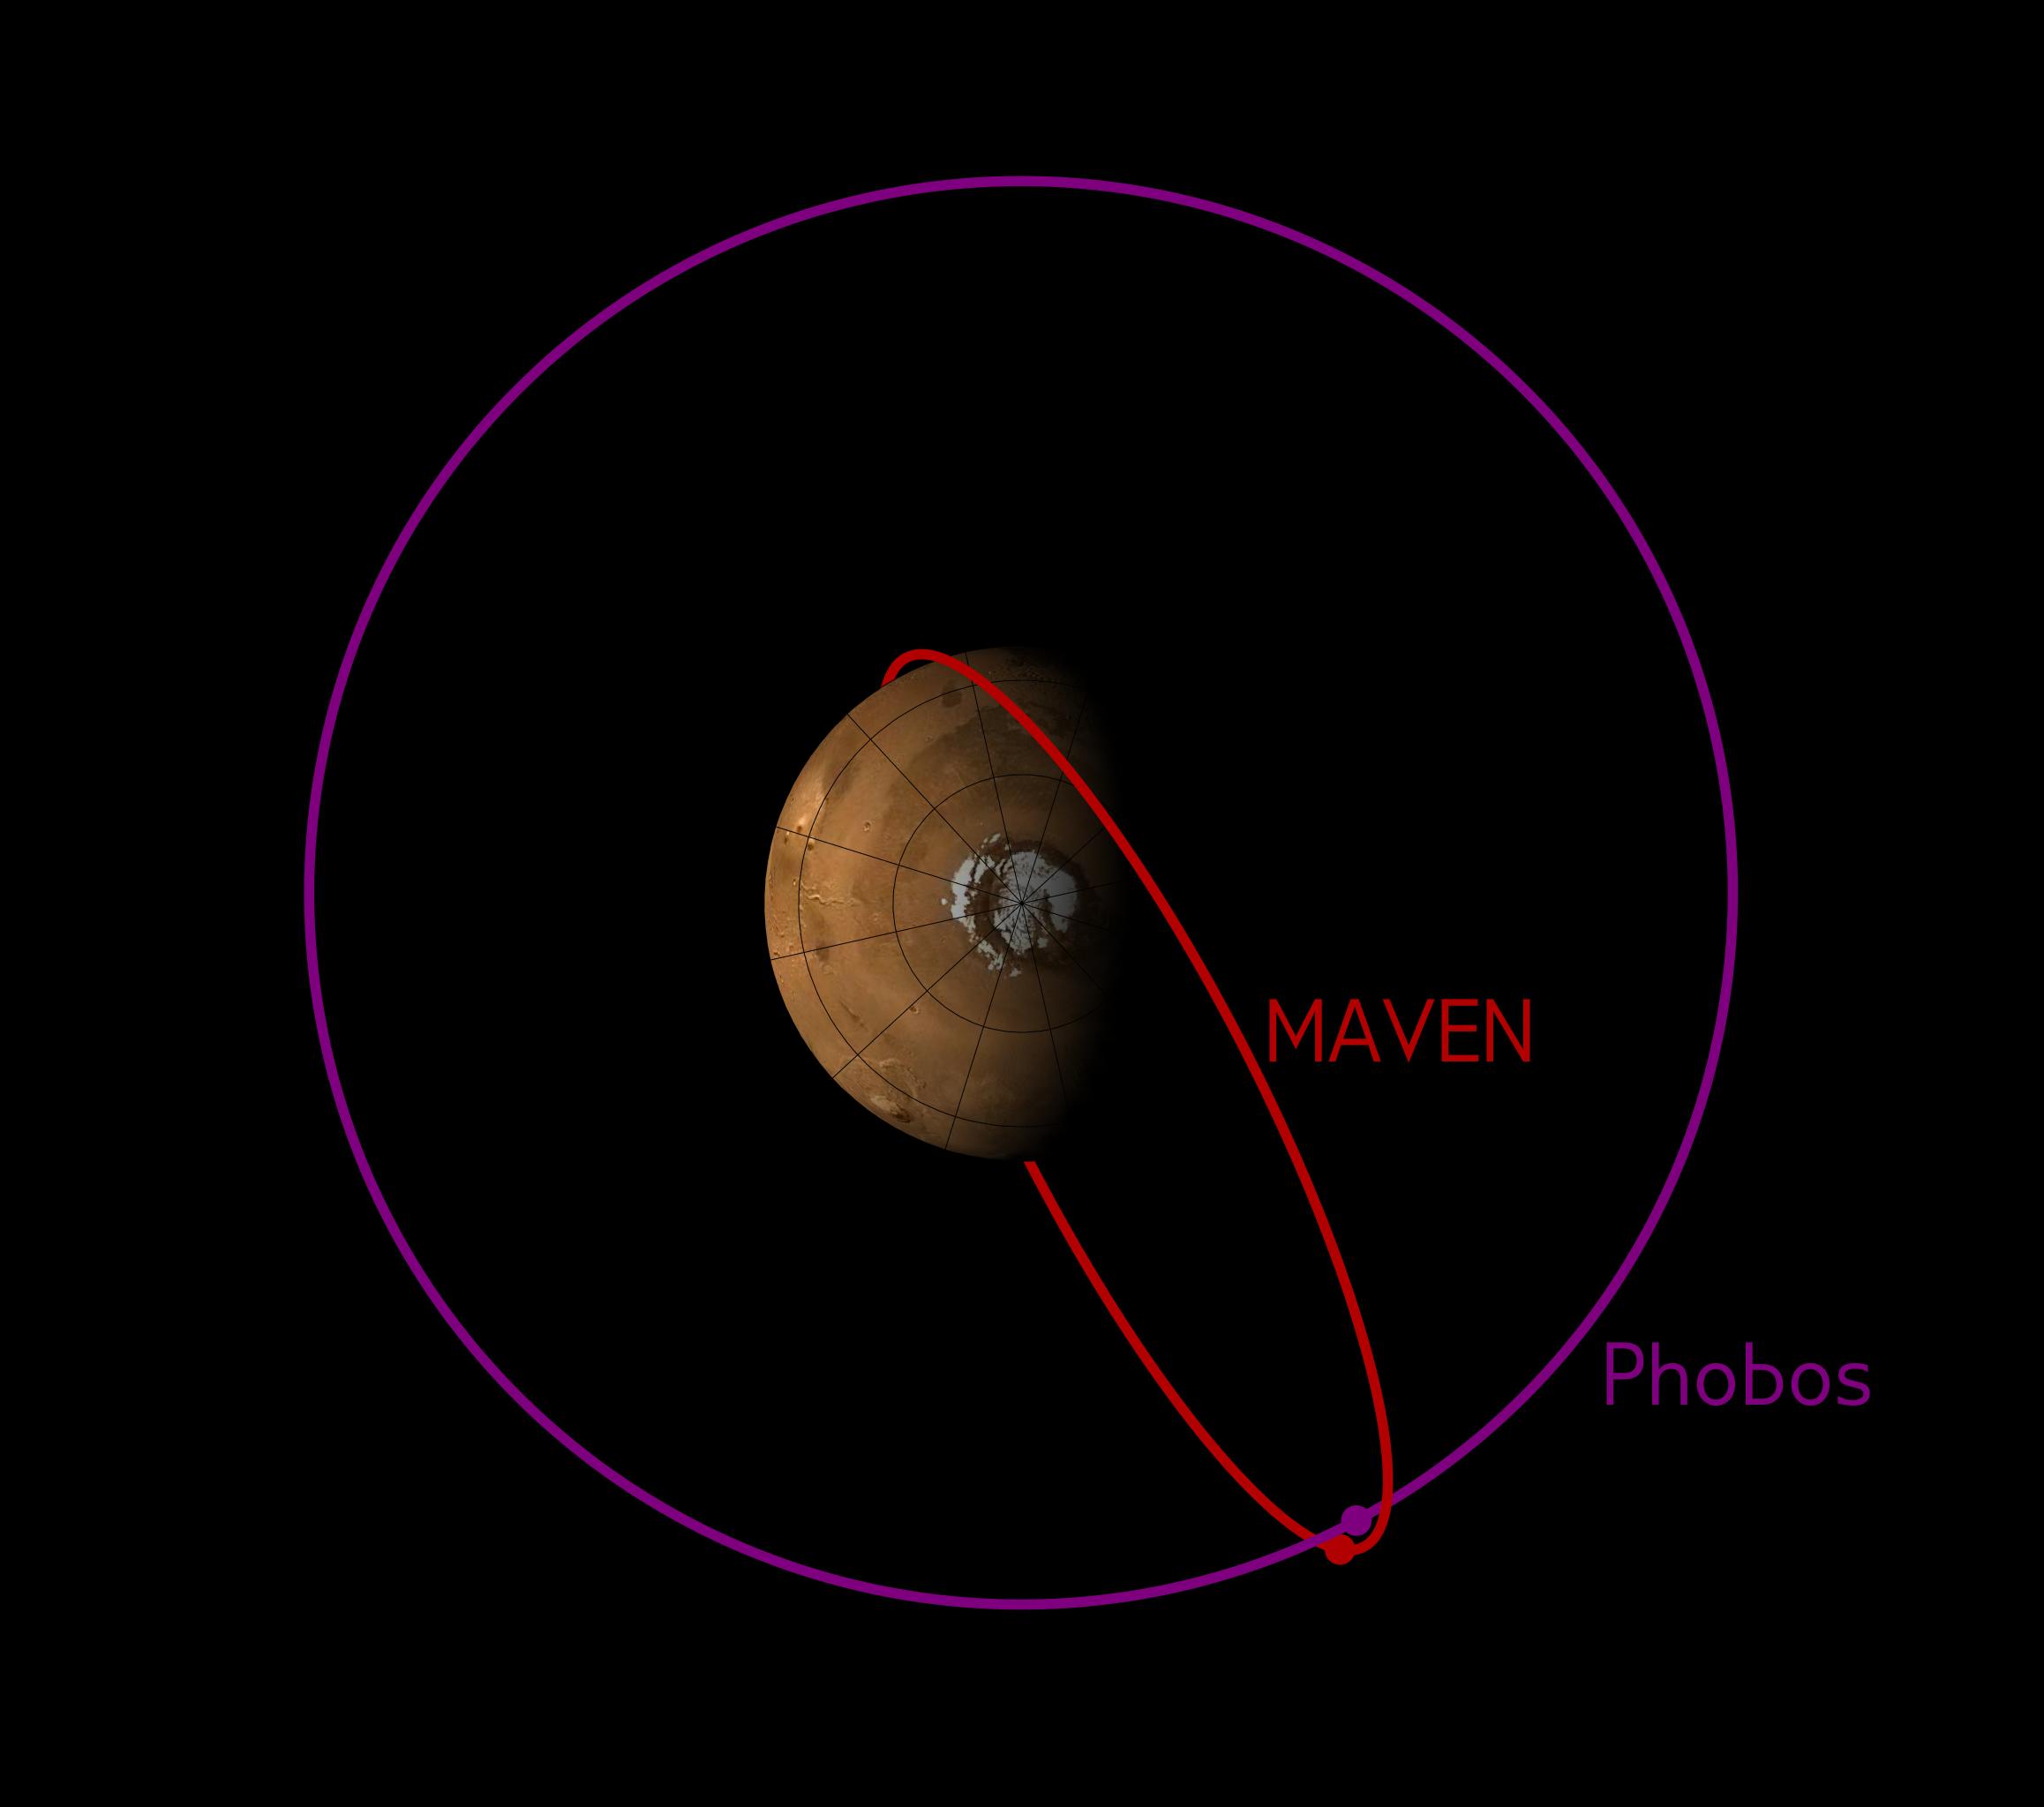 d142c20b48 MAVEN Observes Phobos in Ultraviolet | NASA